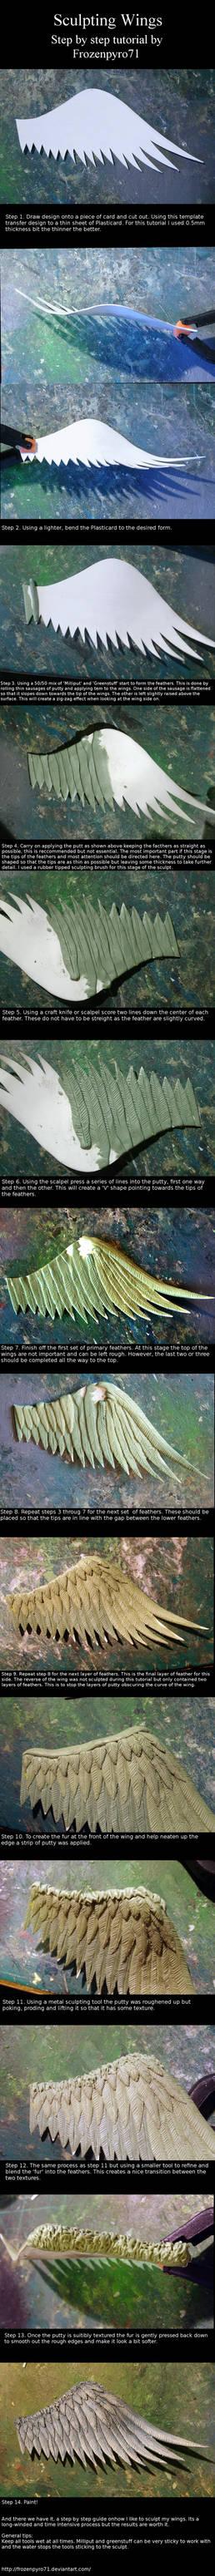 Sculpting wings tutorial